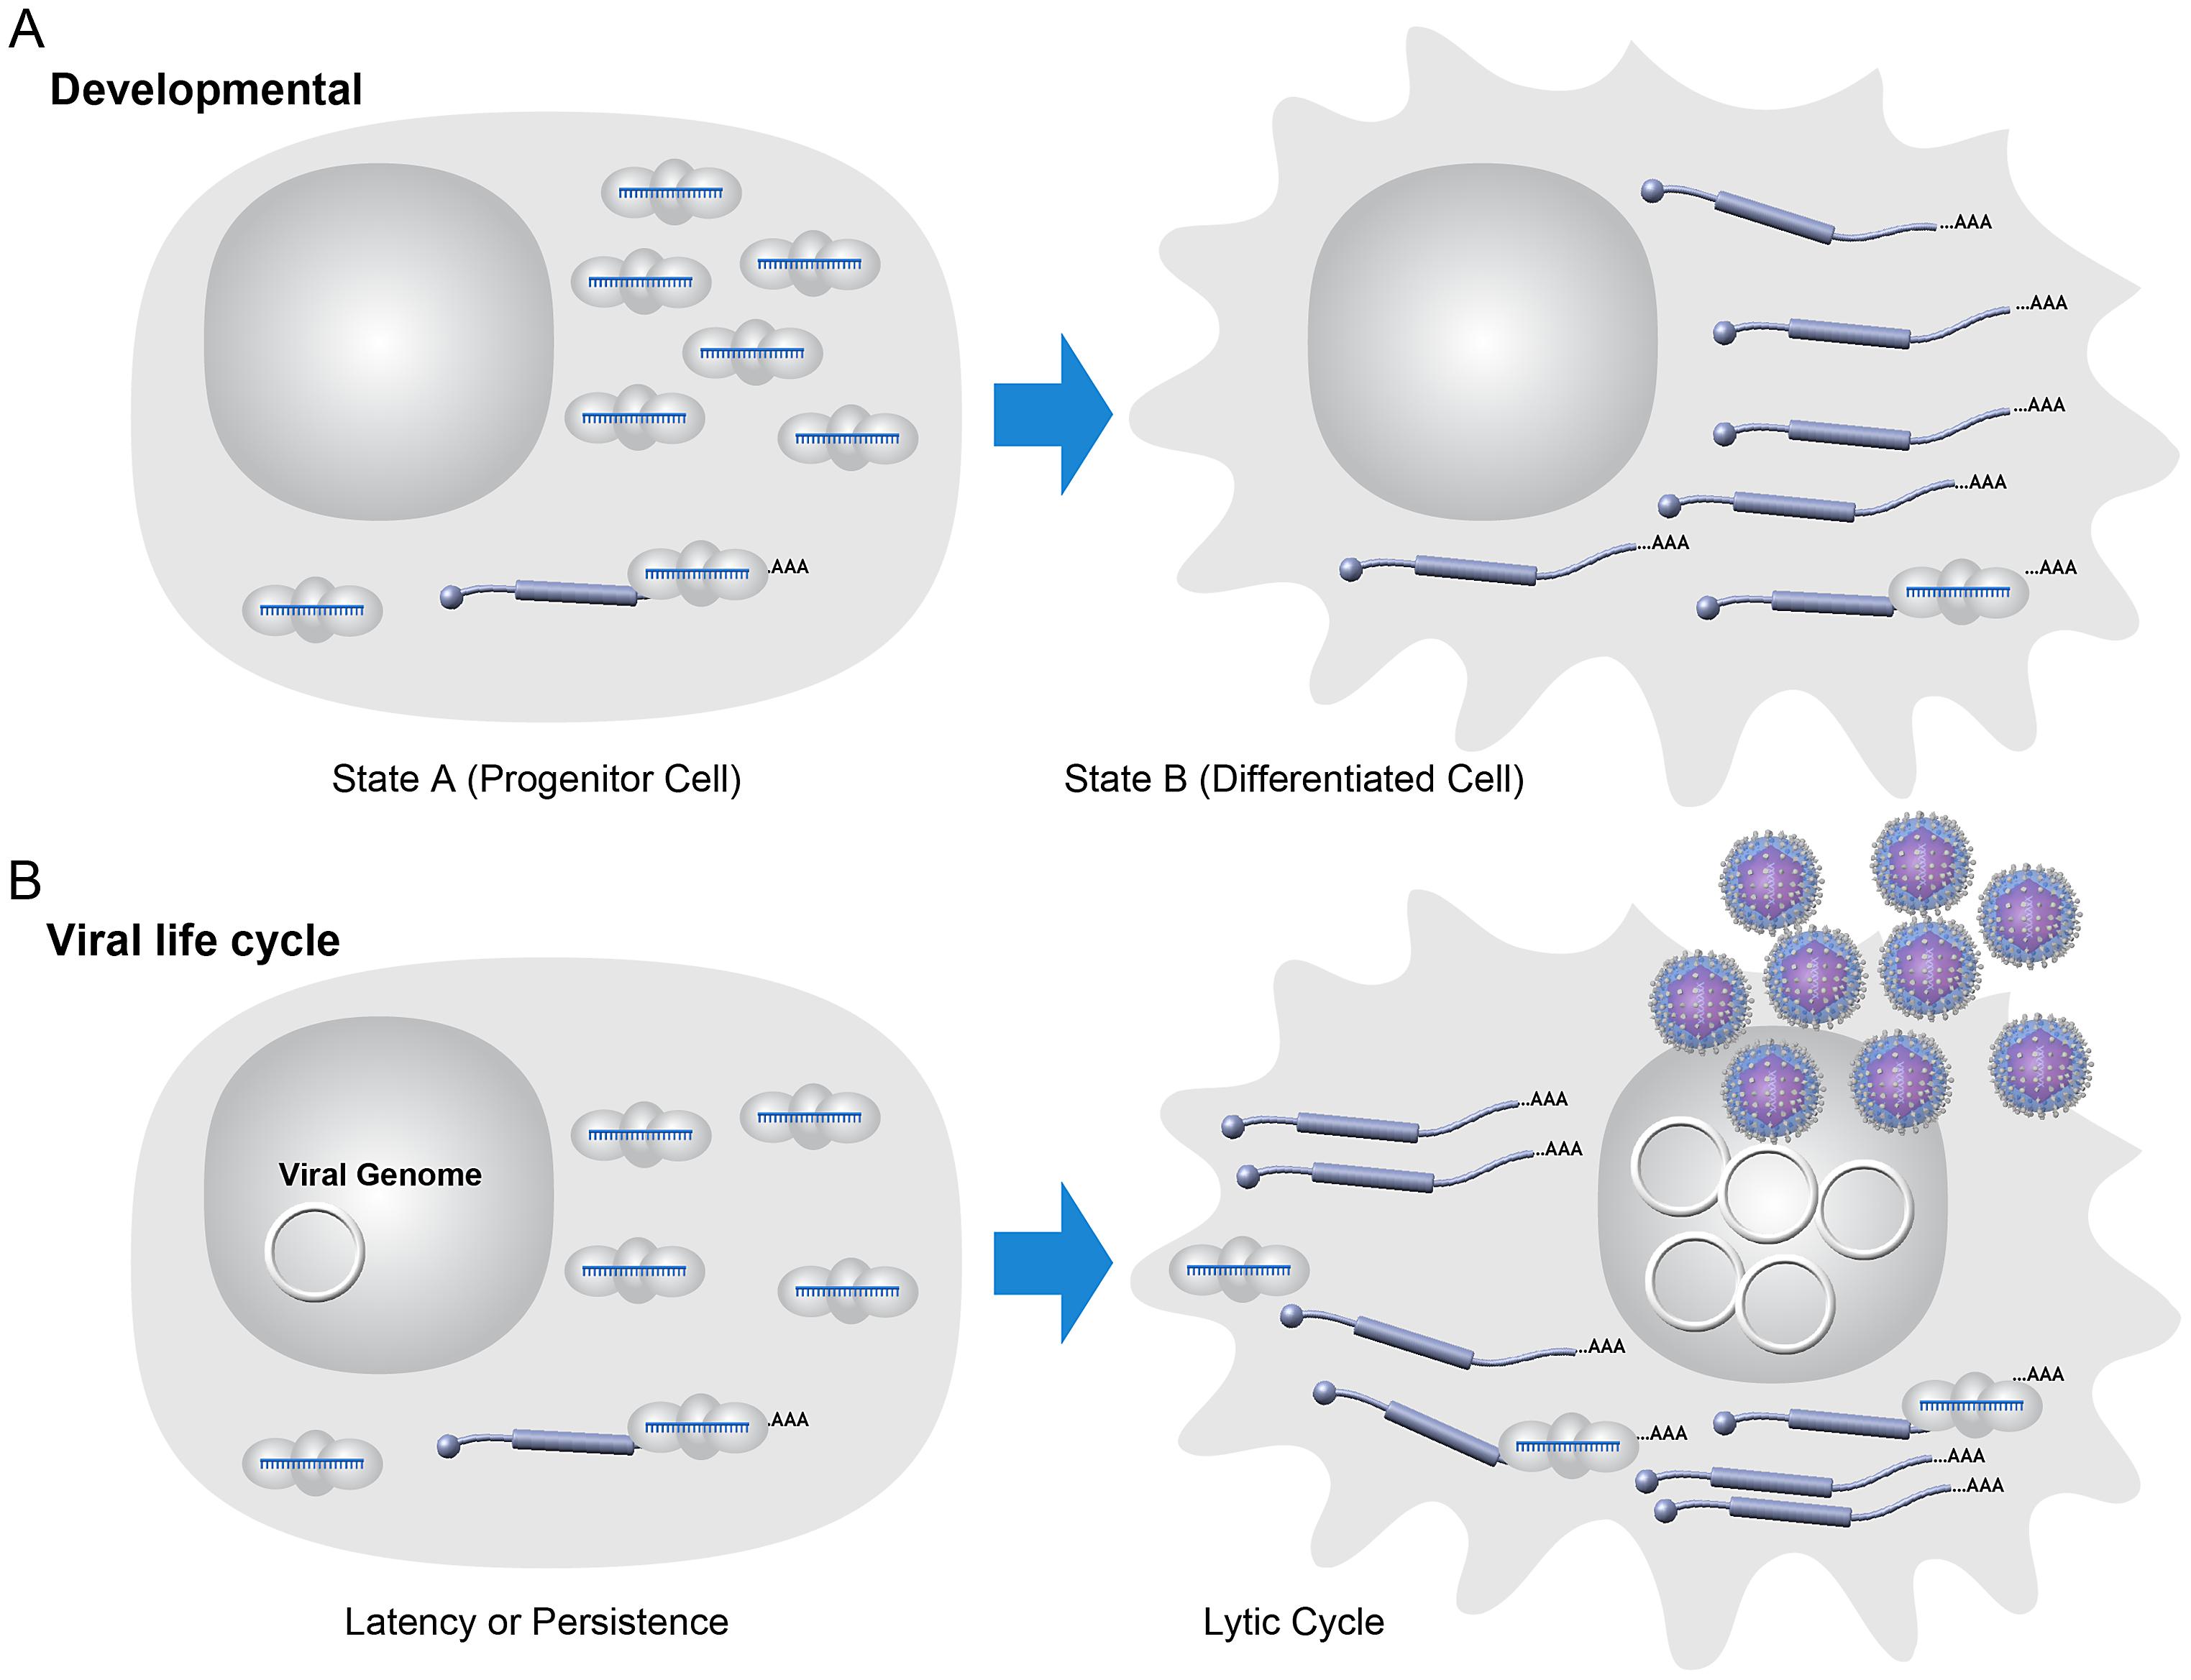 Model: viral latency as a simple developmental process.